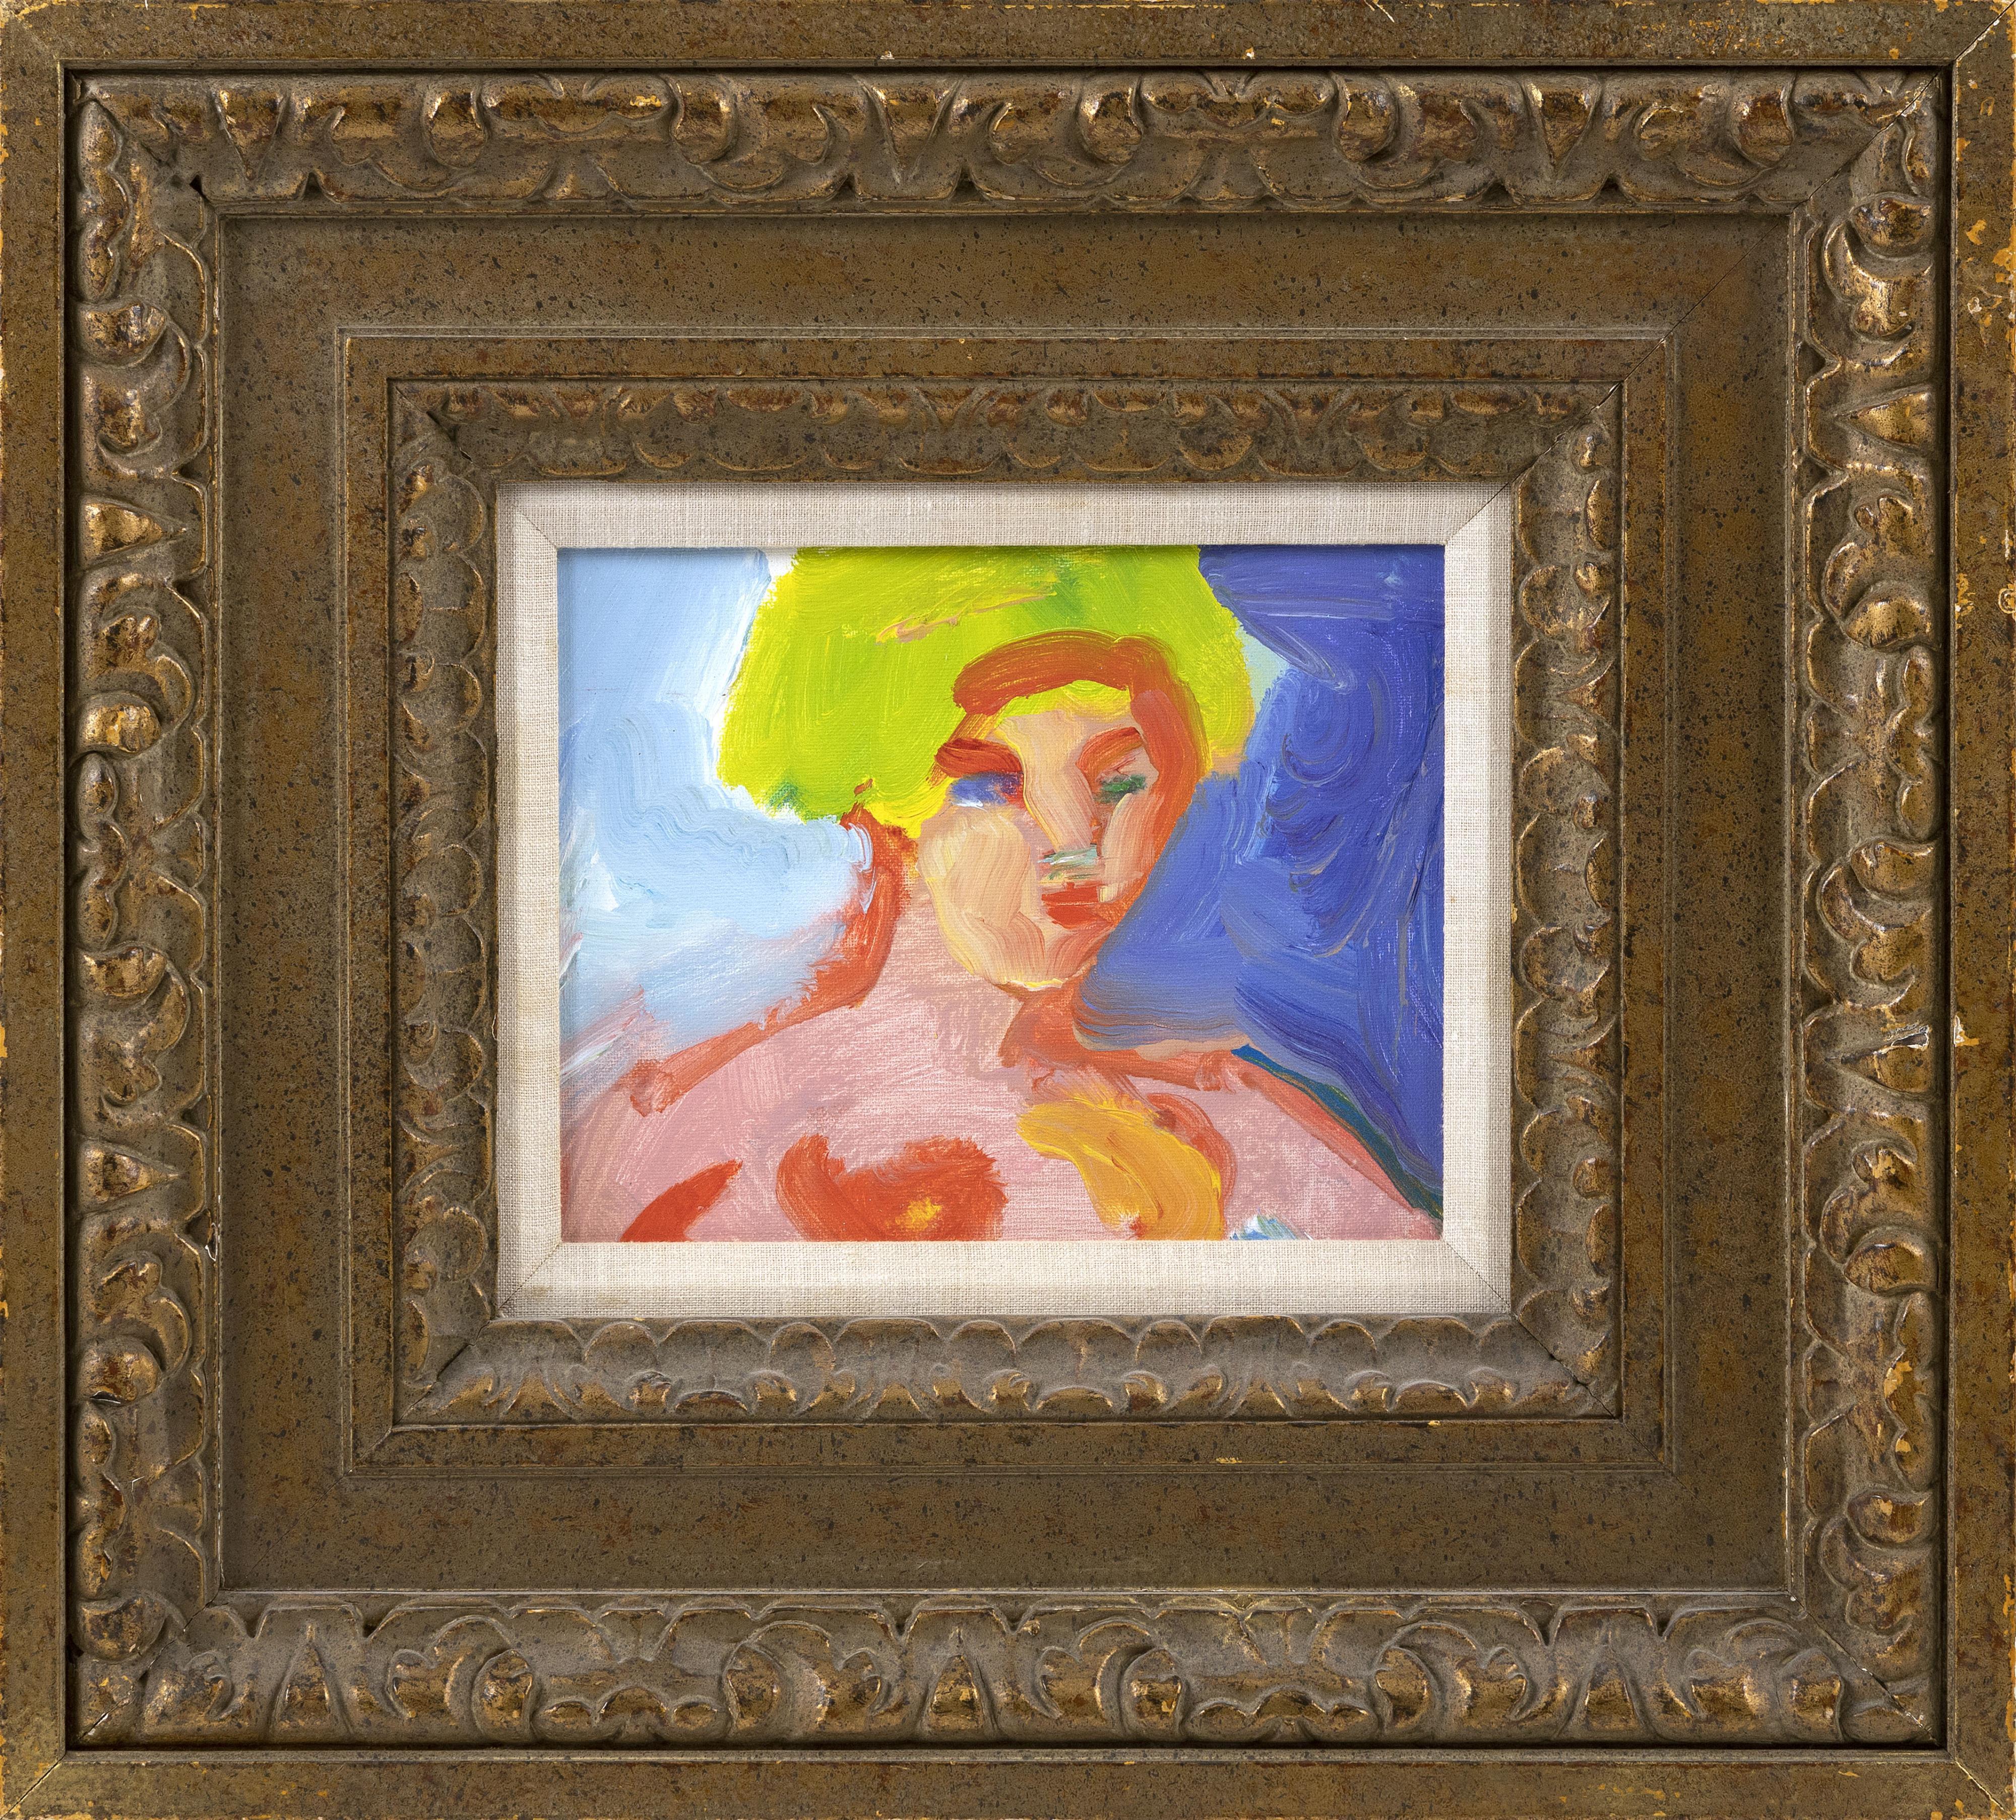 "JOHN GRILLO (Massachusetts, 1917-2014), Bust portrait of a woman., Oil on canvas board, 8"" x 10"". Framed 19.5"" x 21.5""."